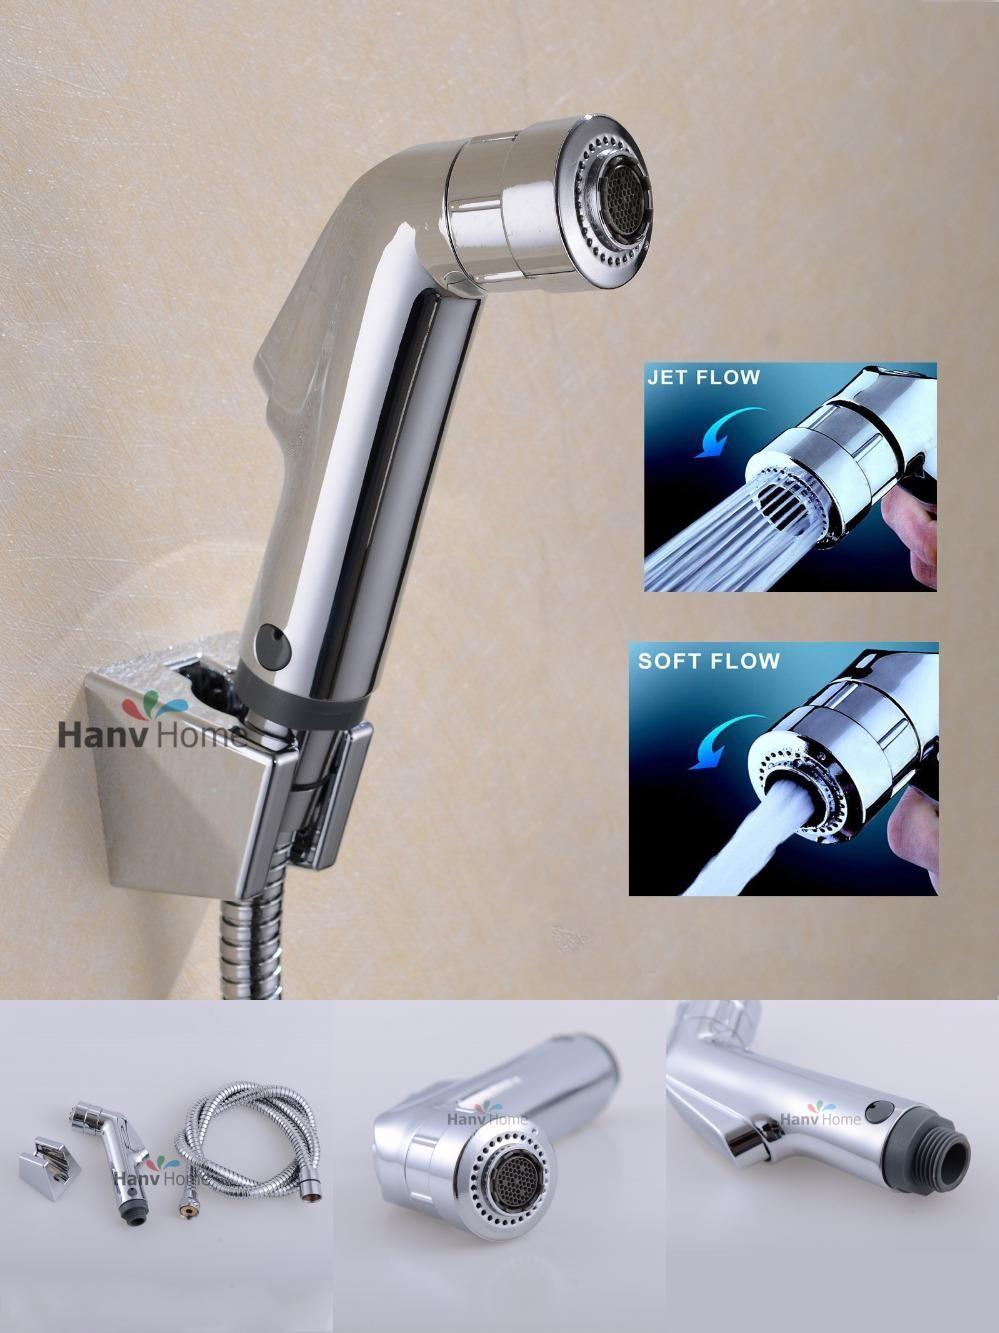 Visit To Buy Double Mode Toliet Bidet Hand Held Portable Bidet Sprayer Shattaf Toilet Shower Spray Set Advertisement Bidet Spray Bidet Bidet Sprayer